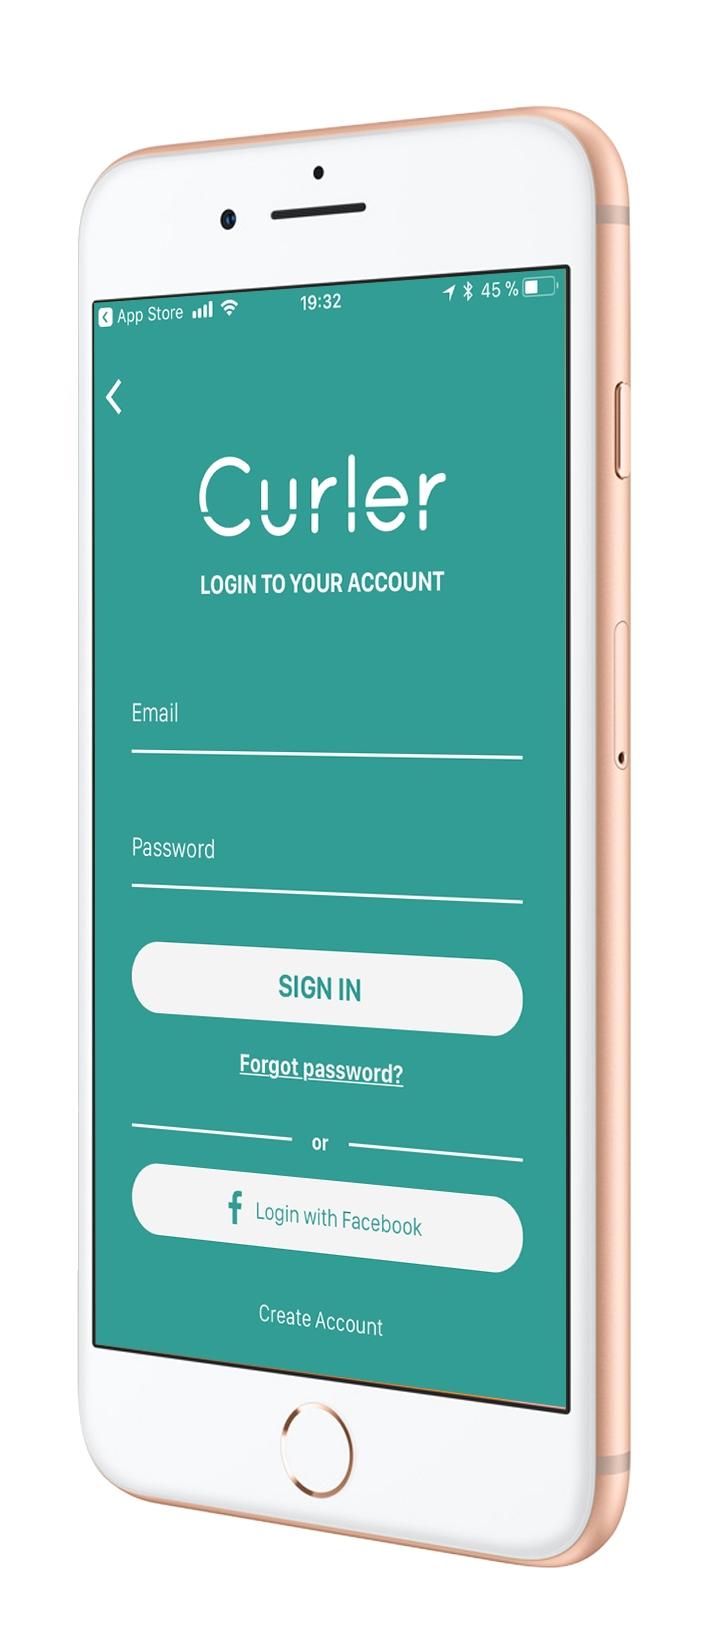 curler sign in2.jpg